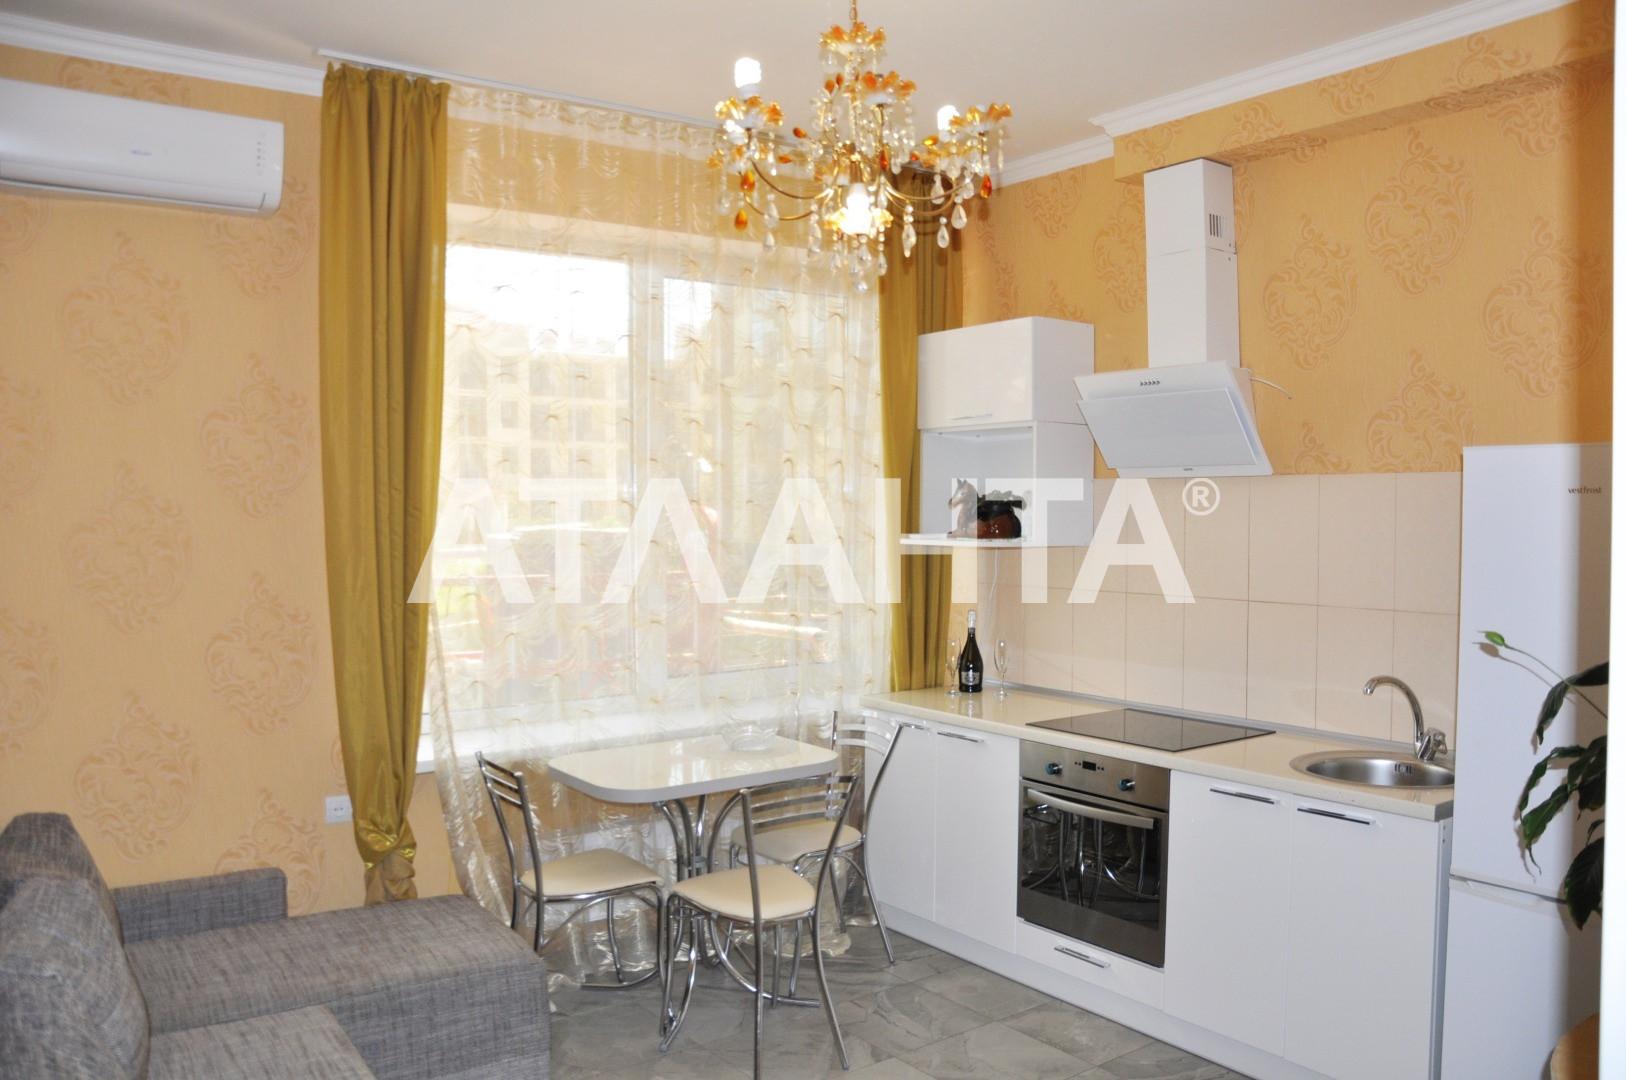 Продается 1-комнатная Квартира на ул. Французский Бул. (Пролетарский Бул.) — 52 000 у.е.